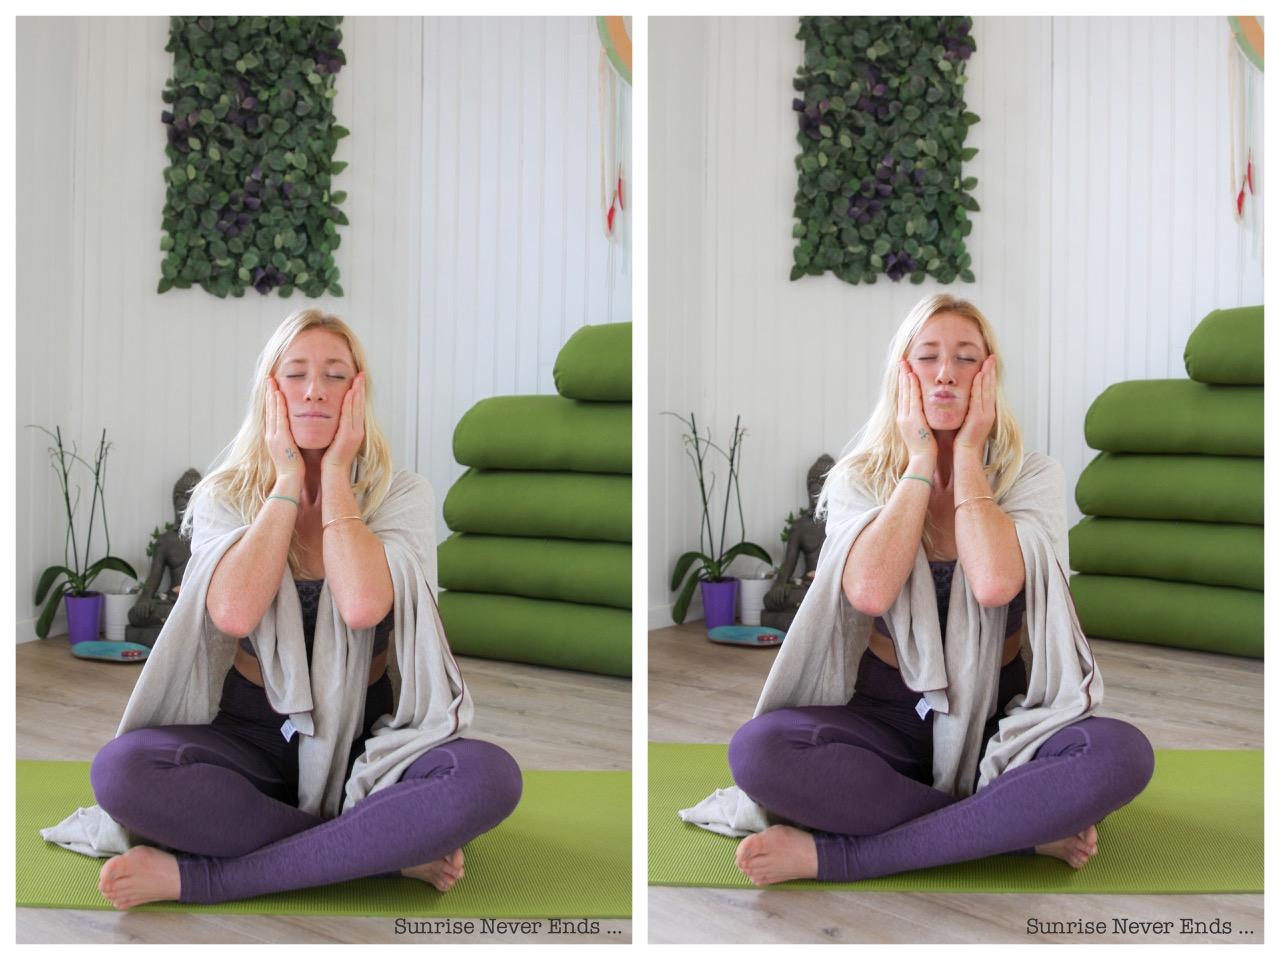 sidney,yoga,face yoga,free bird yoga,hossegor,odlo,thinking mu,yuan lan,plaid de yoga,yoga pant,cours de yoga,